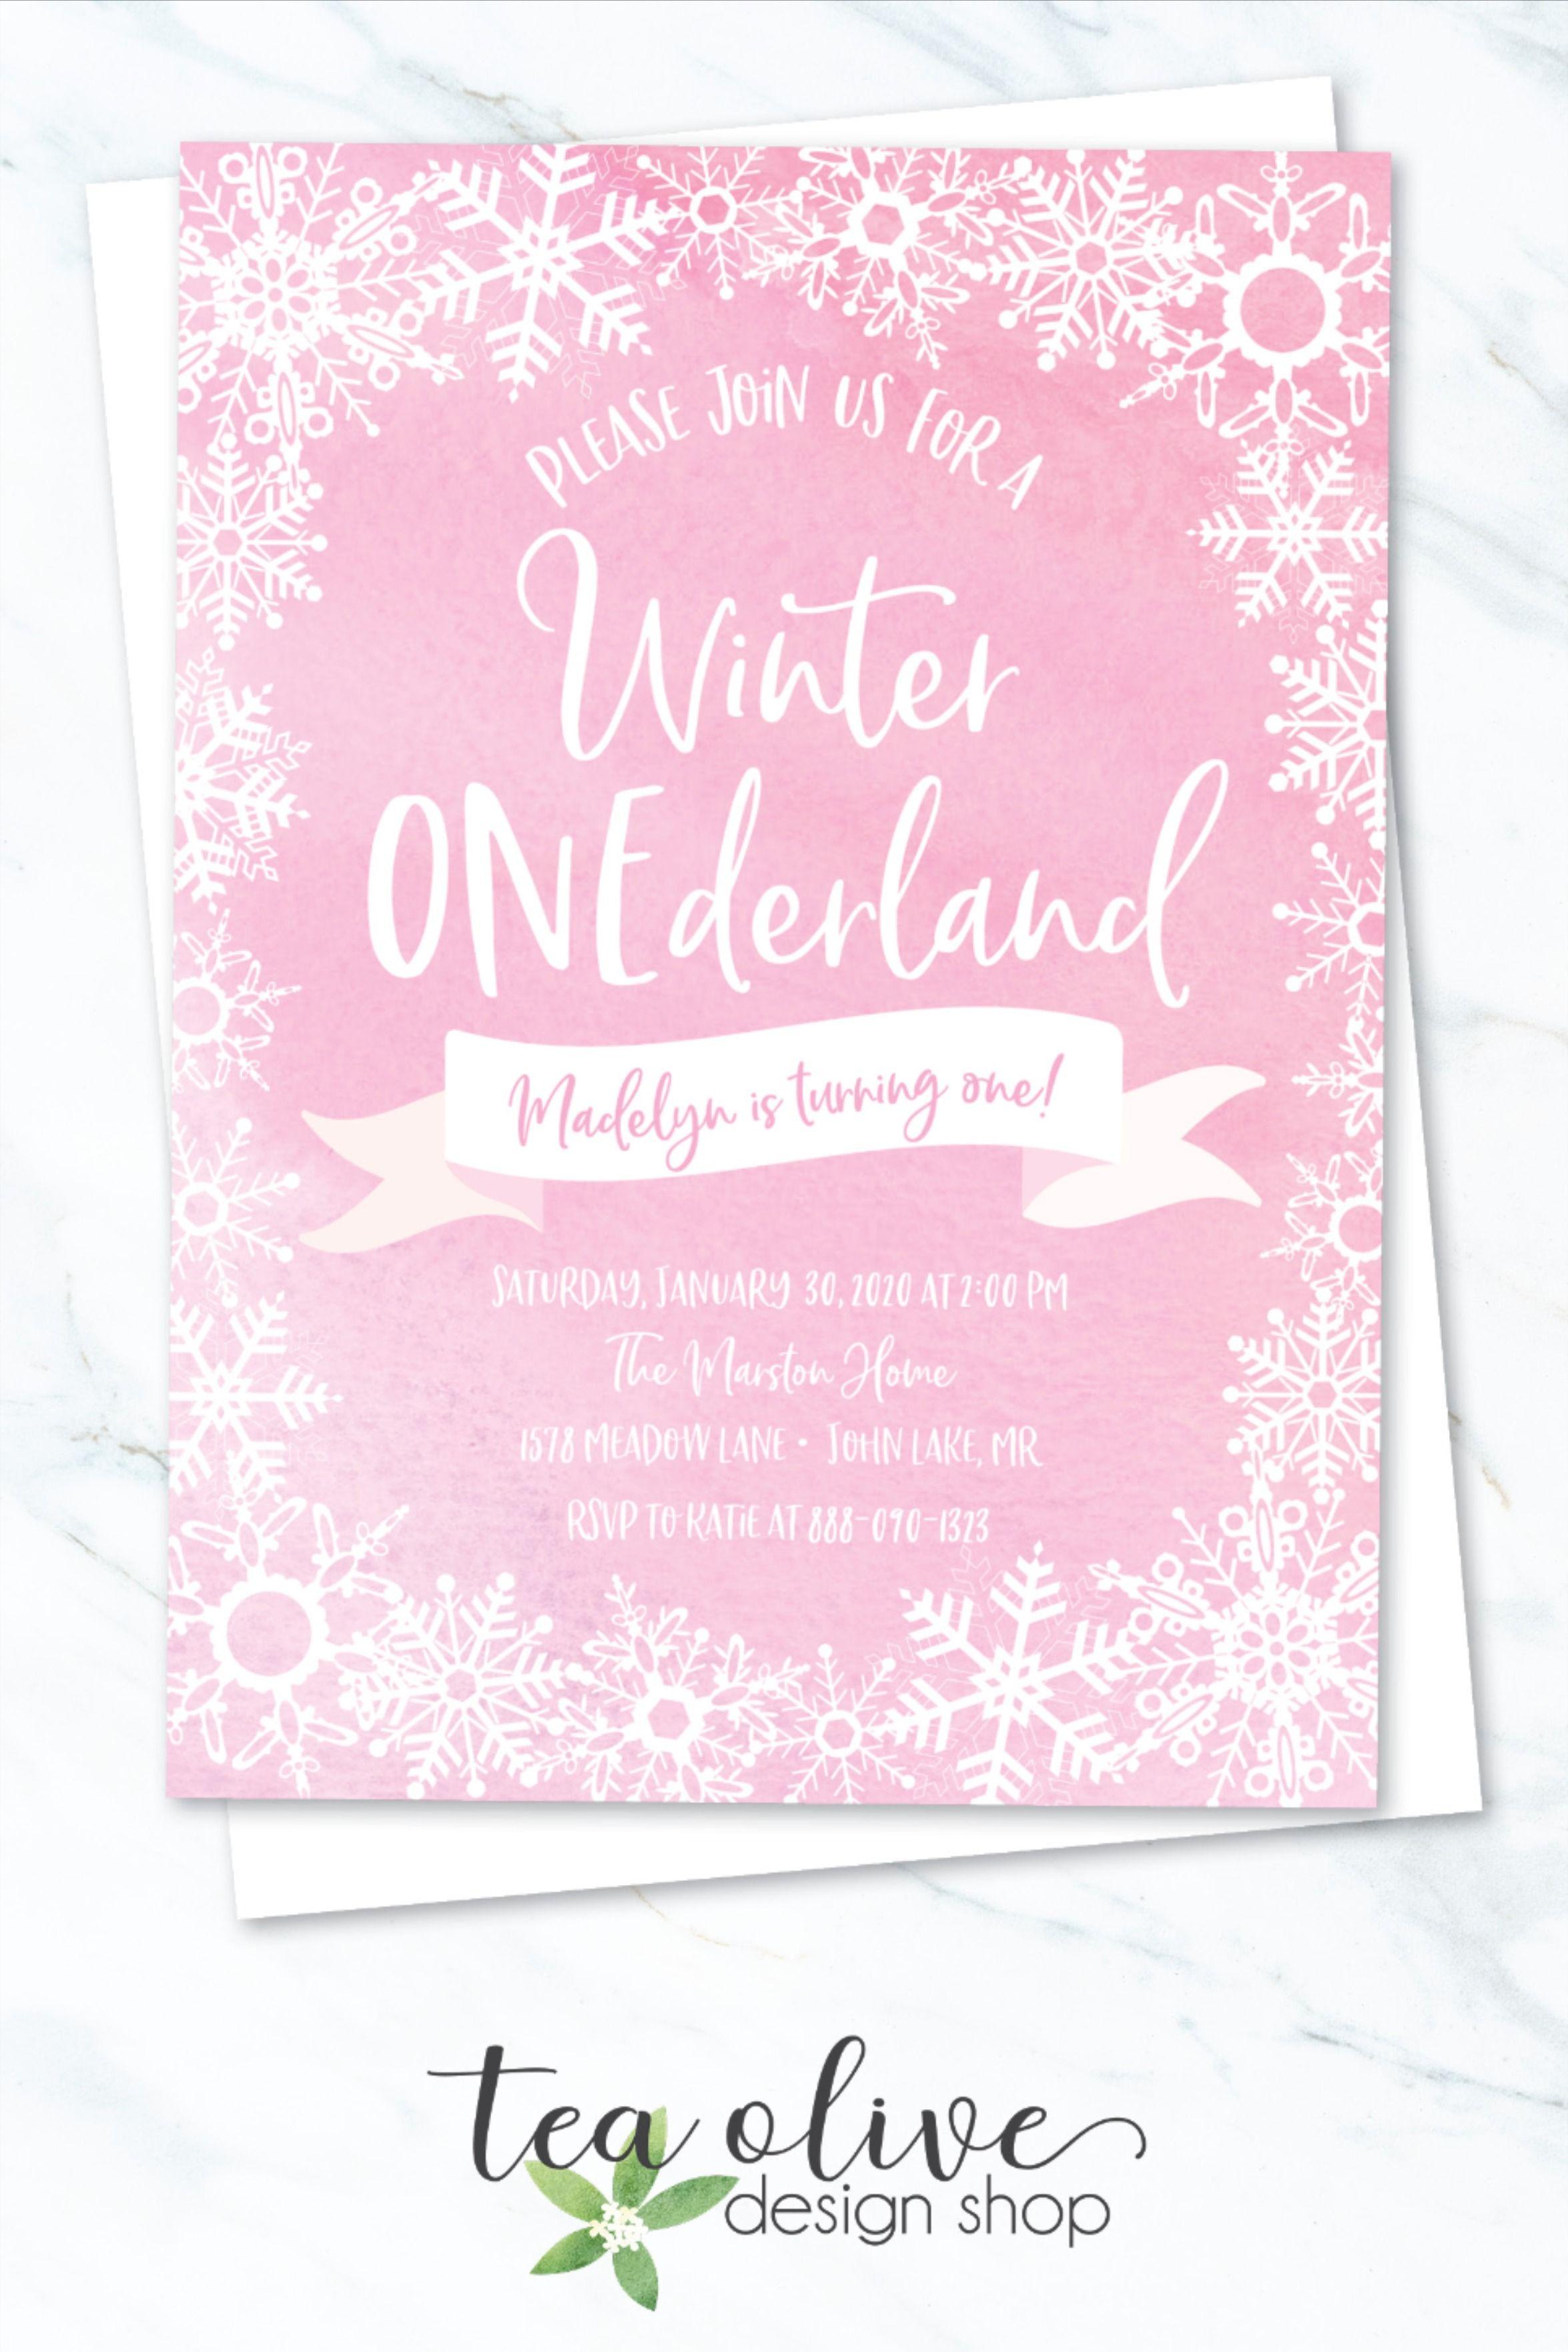 Snowflake Birthday Party Invitation Winter Onederland Etsy In 2021 Winter Onederland Birthday Invitations Snowflake Birthday Party Winter Onederland Birthday Party